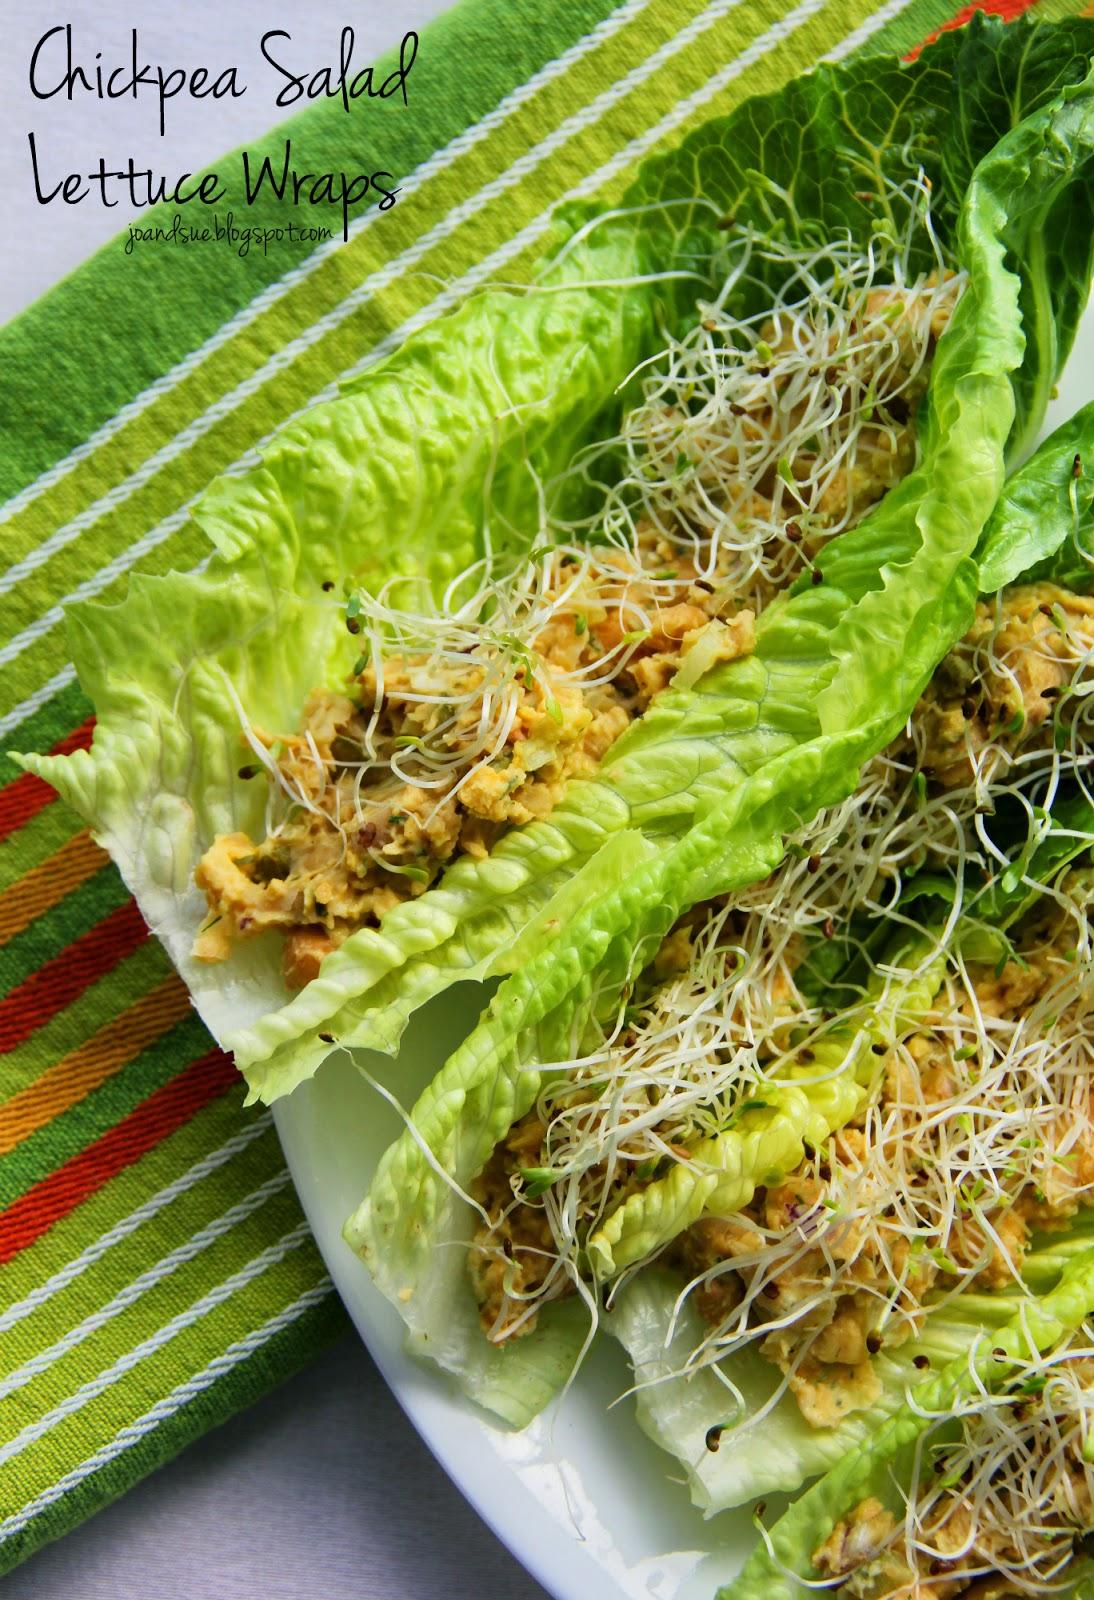 Jo and Sue: Chickpea Salad Lettuce Wraps